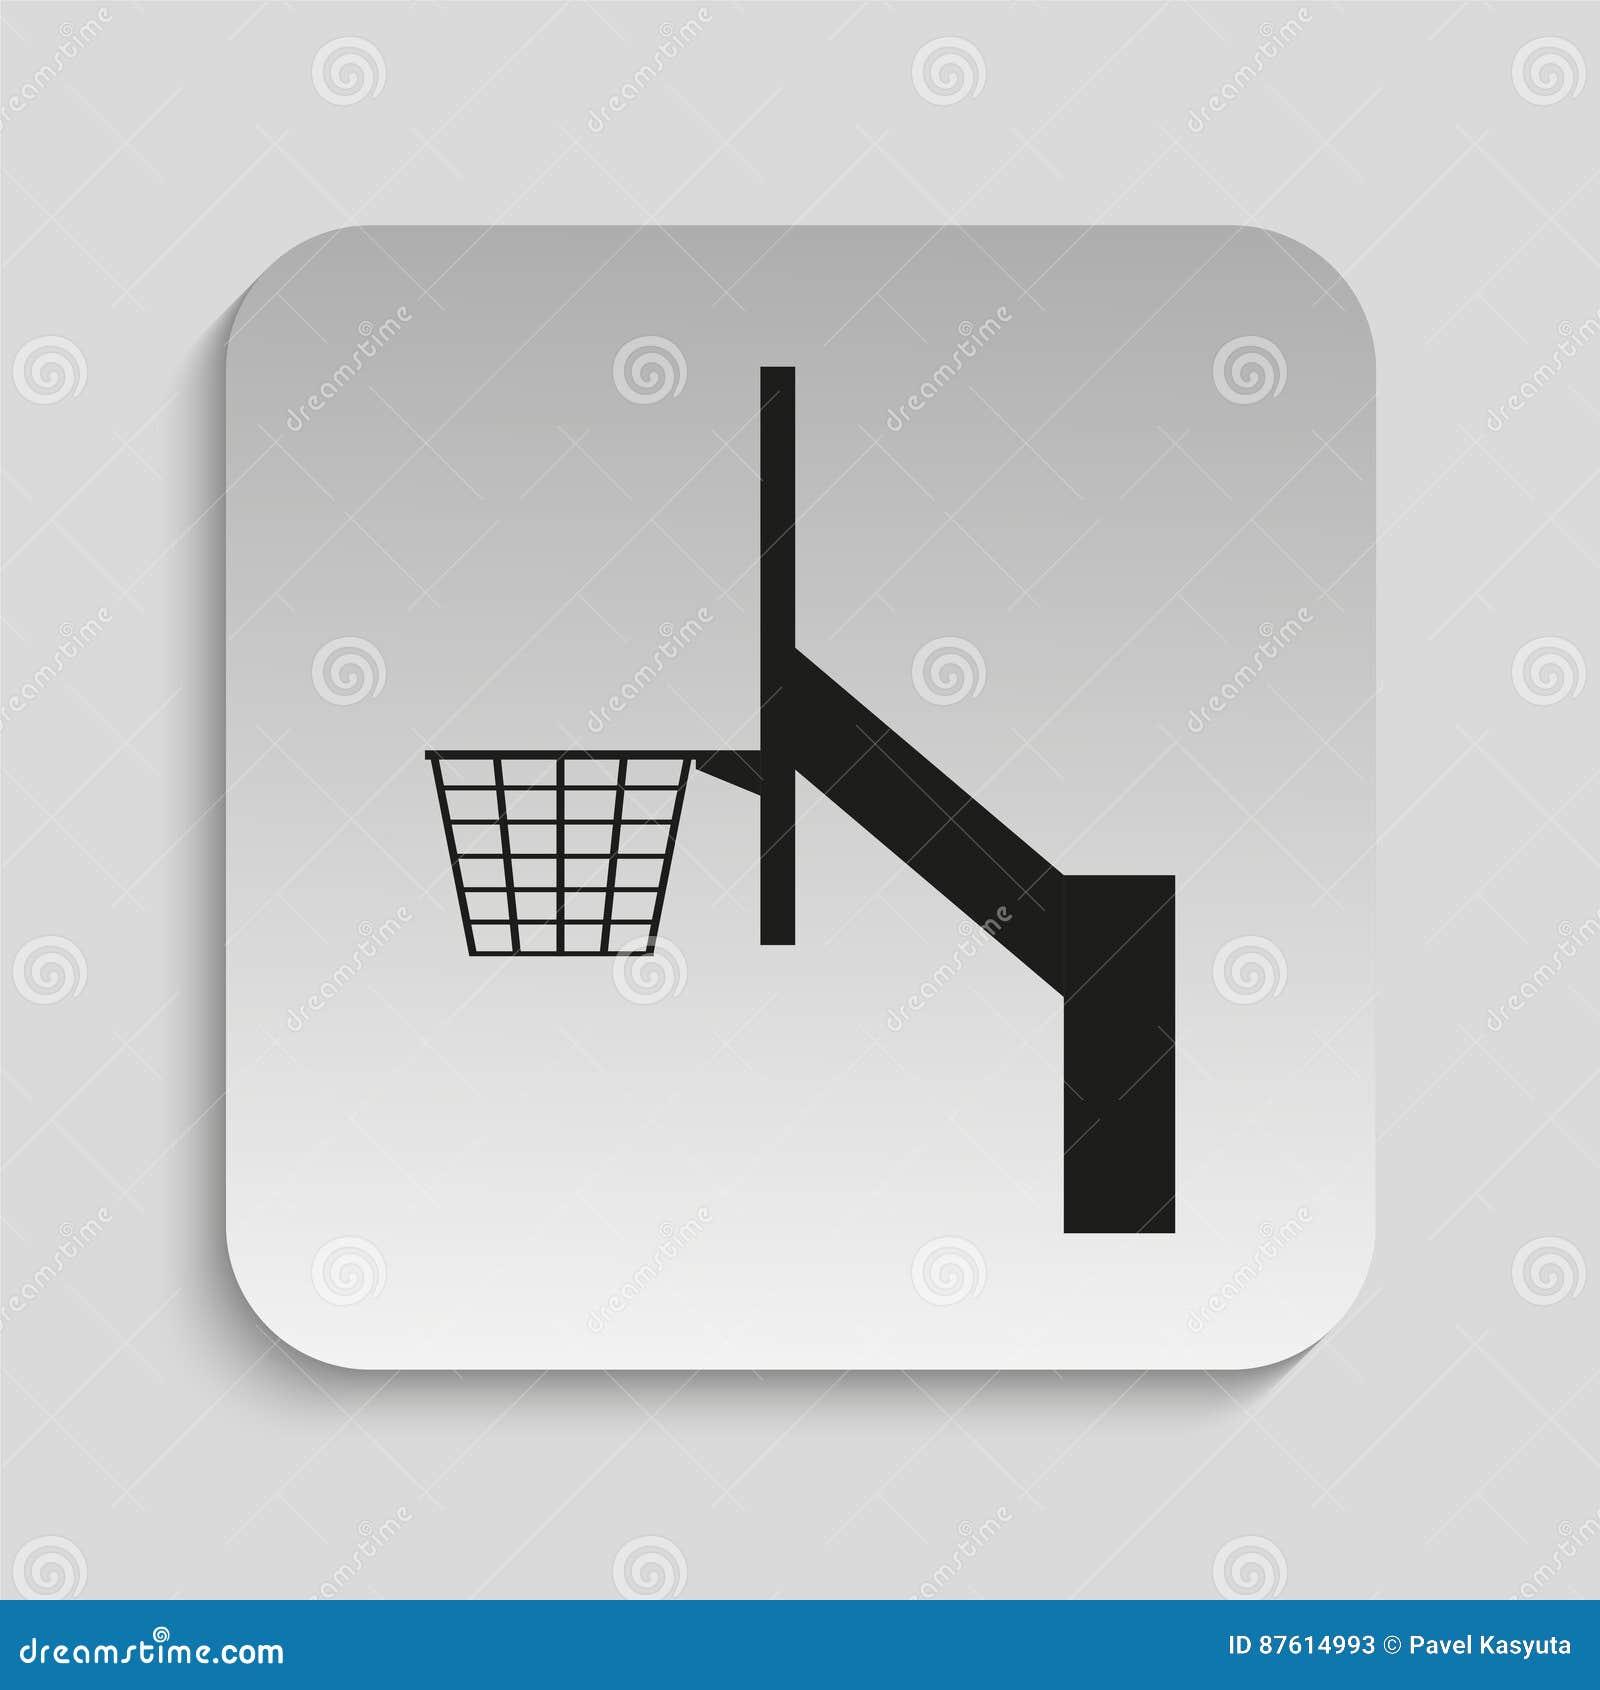 Basketball Hoop Vector Icon Stock Illustration Of Diagram